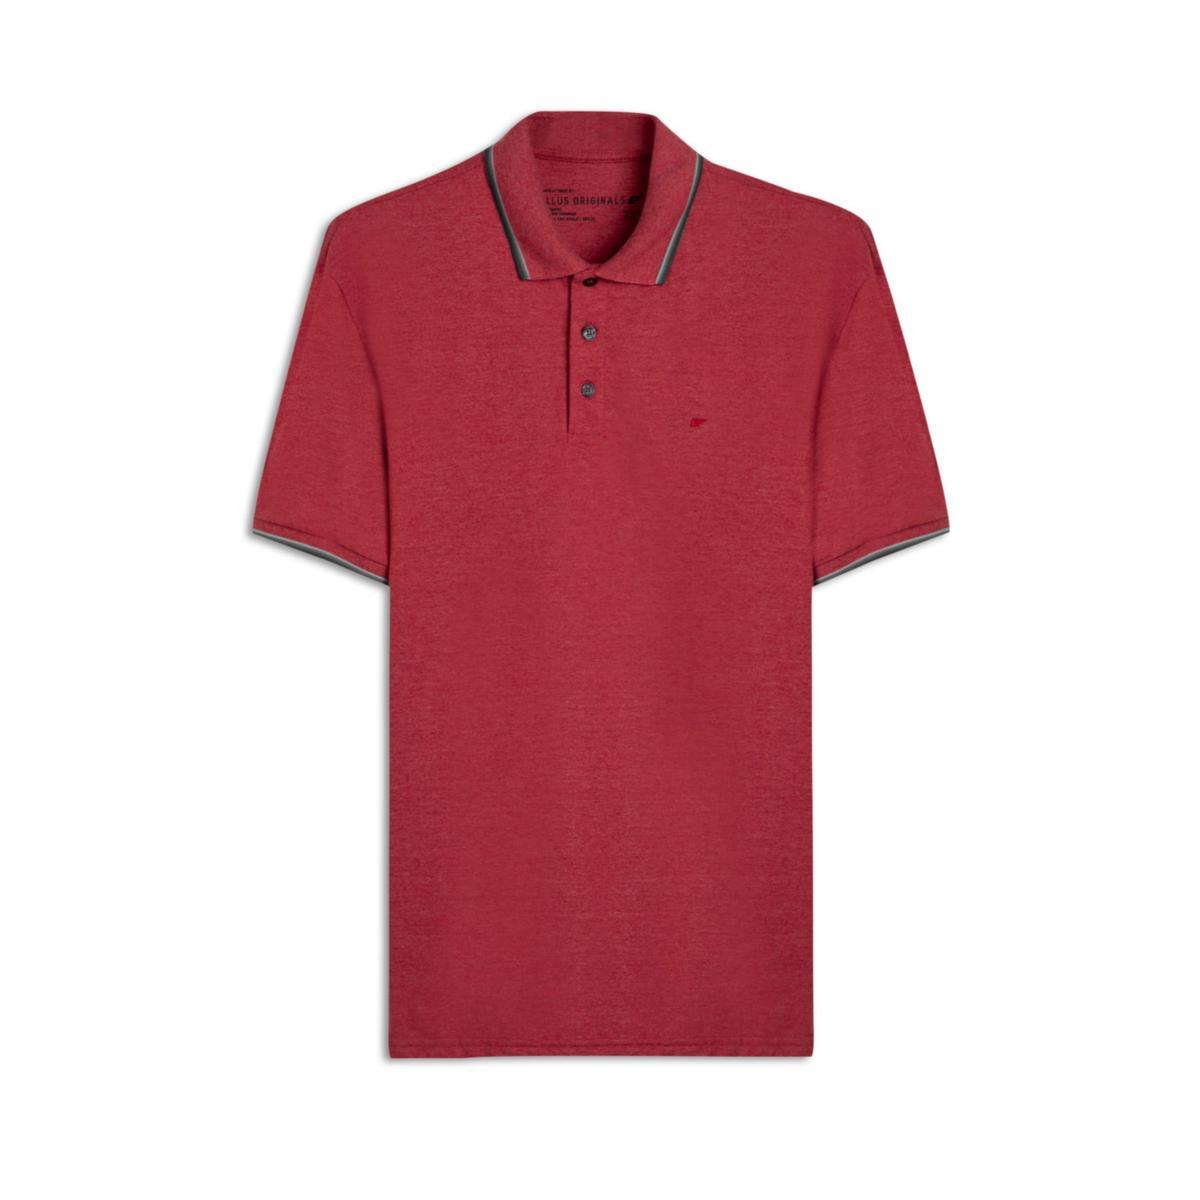 Camiseta Masculina Ellus B672a  401 Vermelho